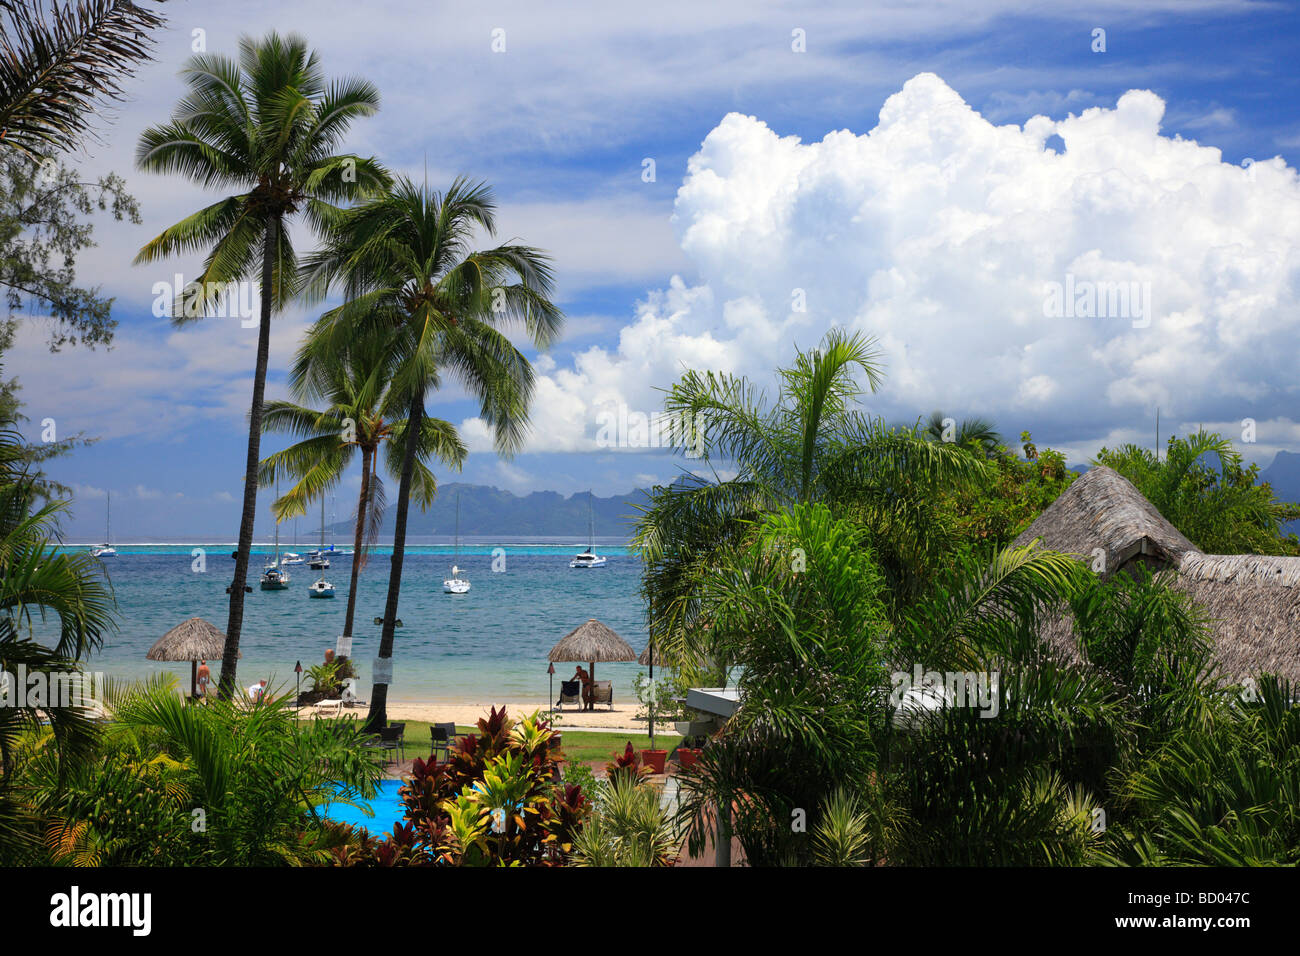 Tahiti French Polynesia - Stock Image